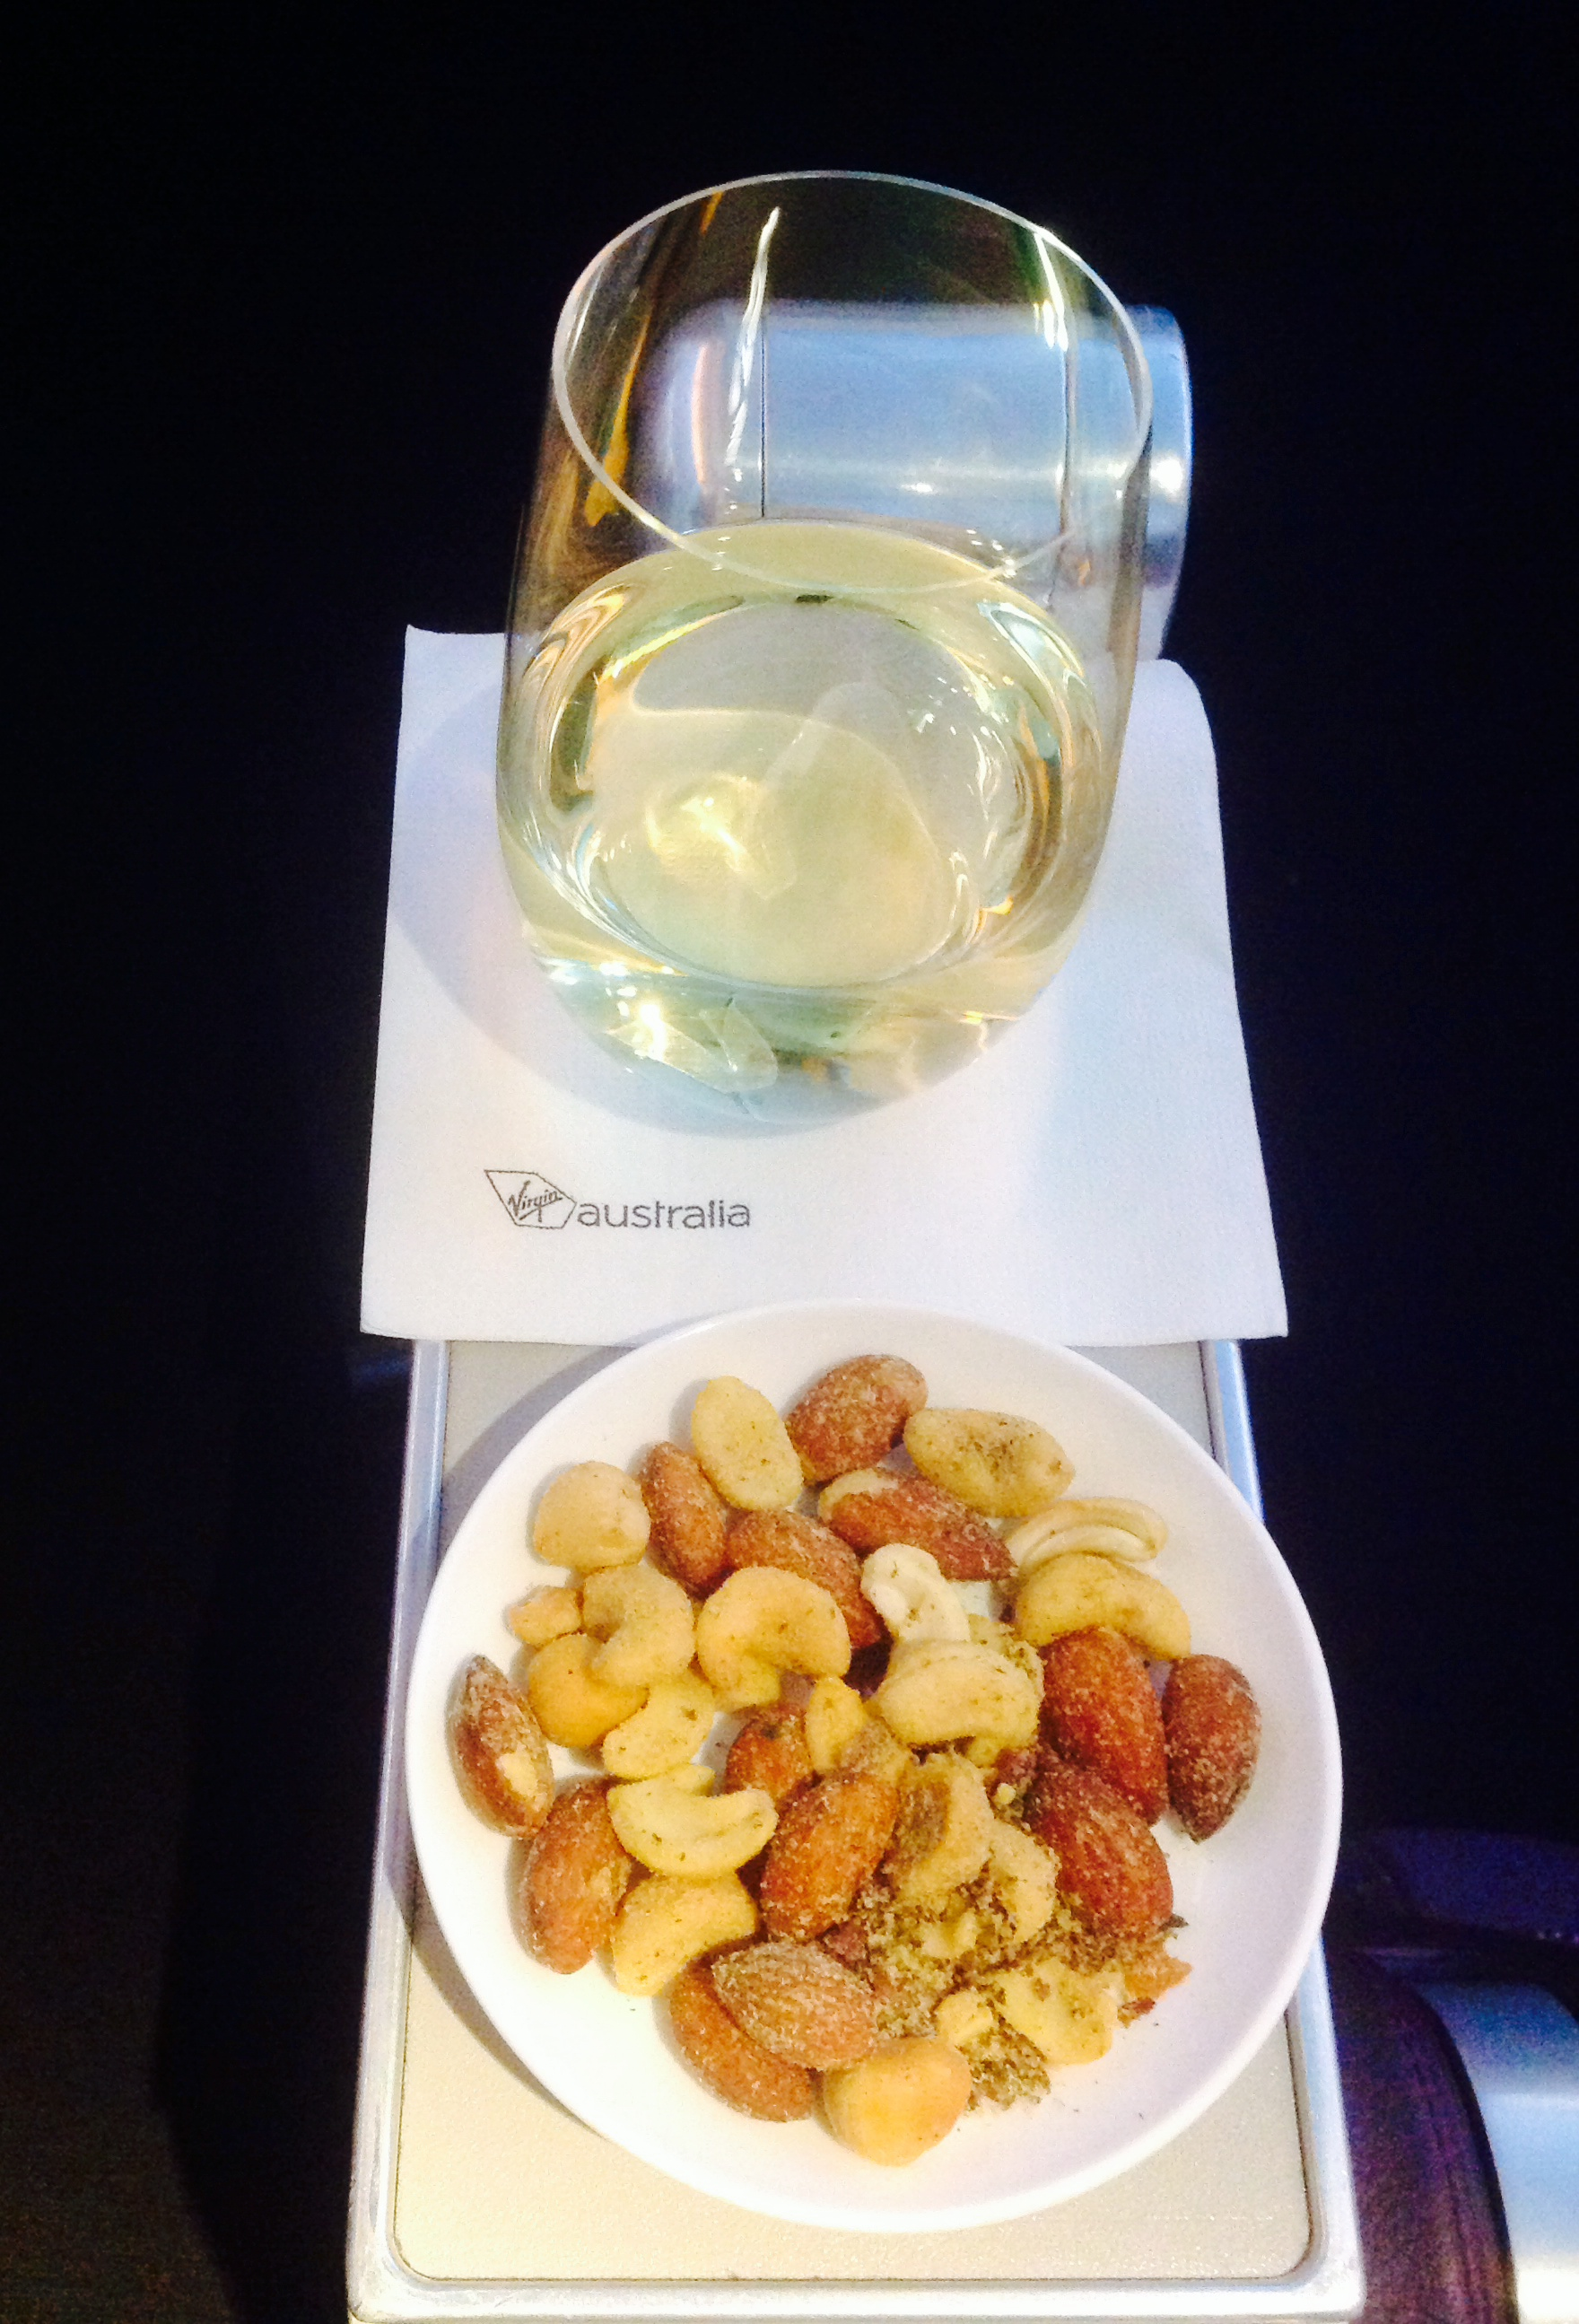 Sav Blanc and Warm Nuts upon boarding